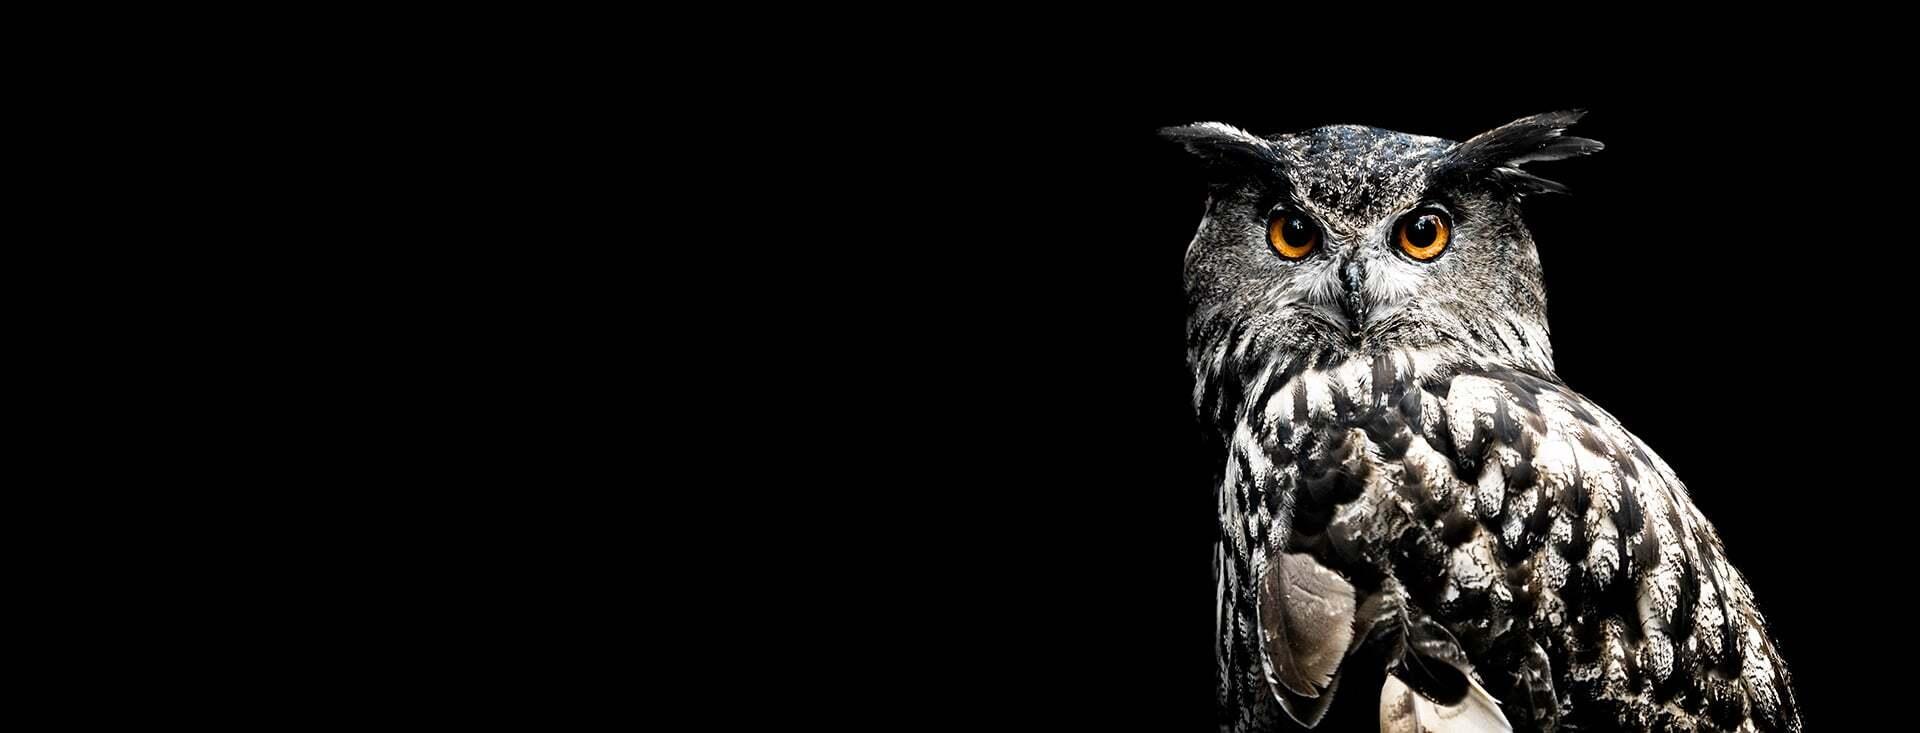 Owl Looking straight ahead